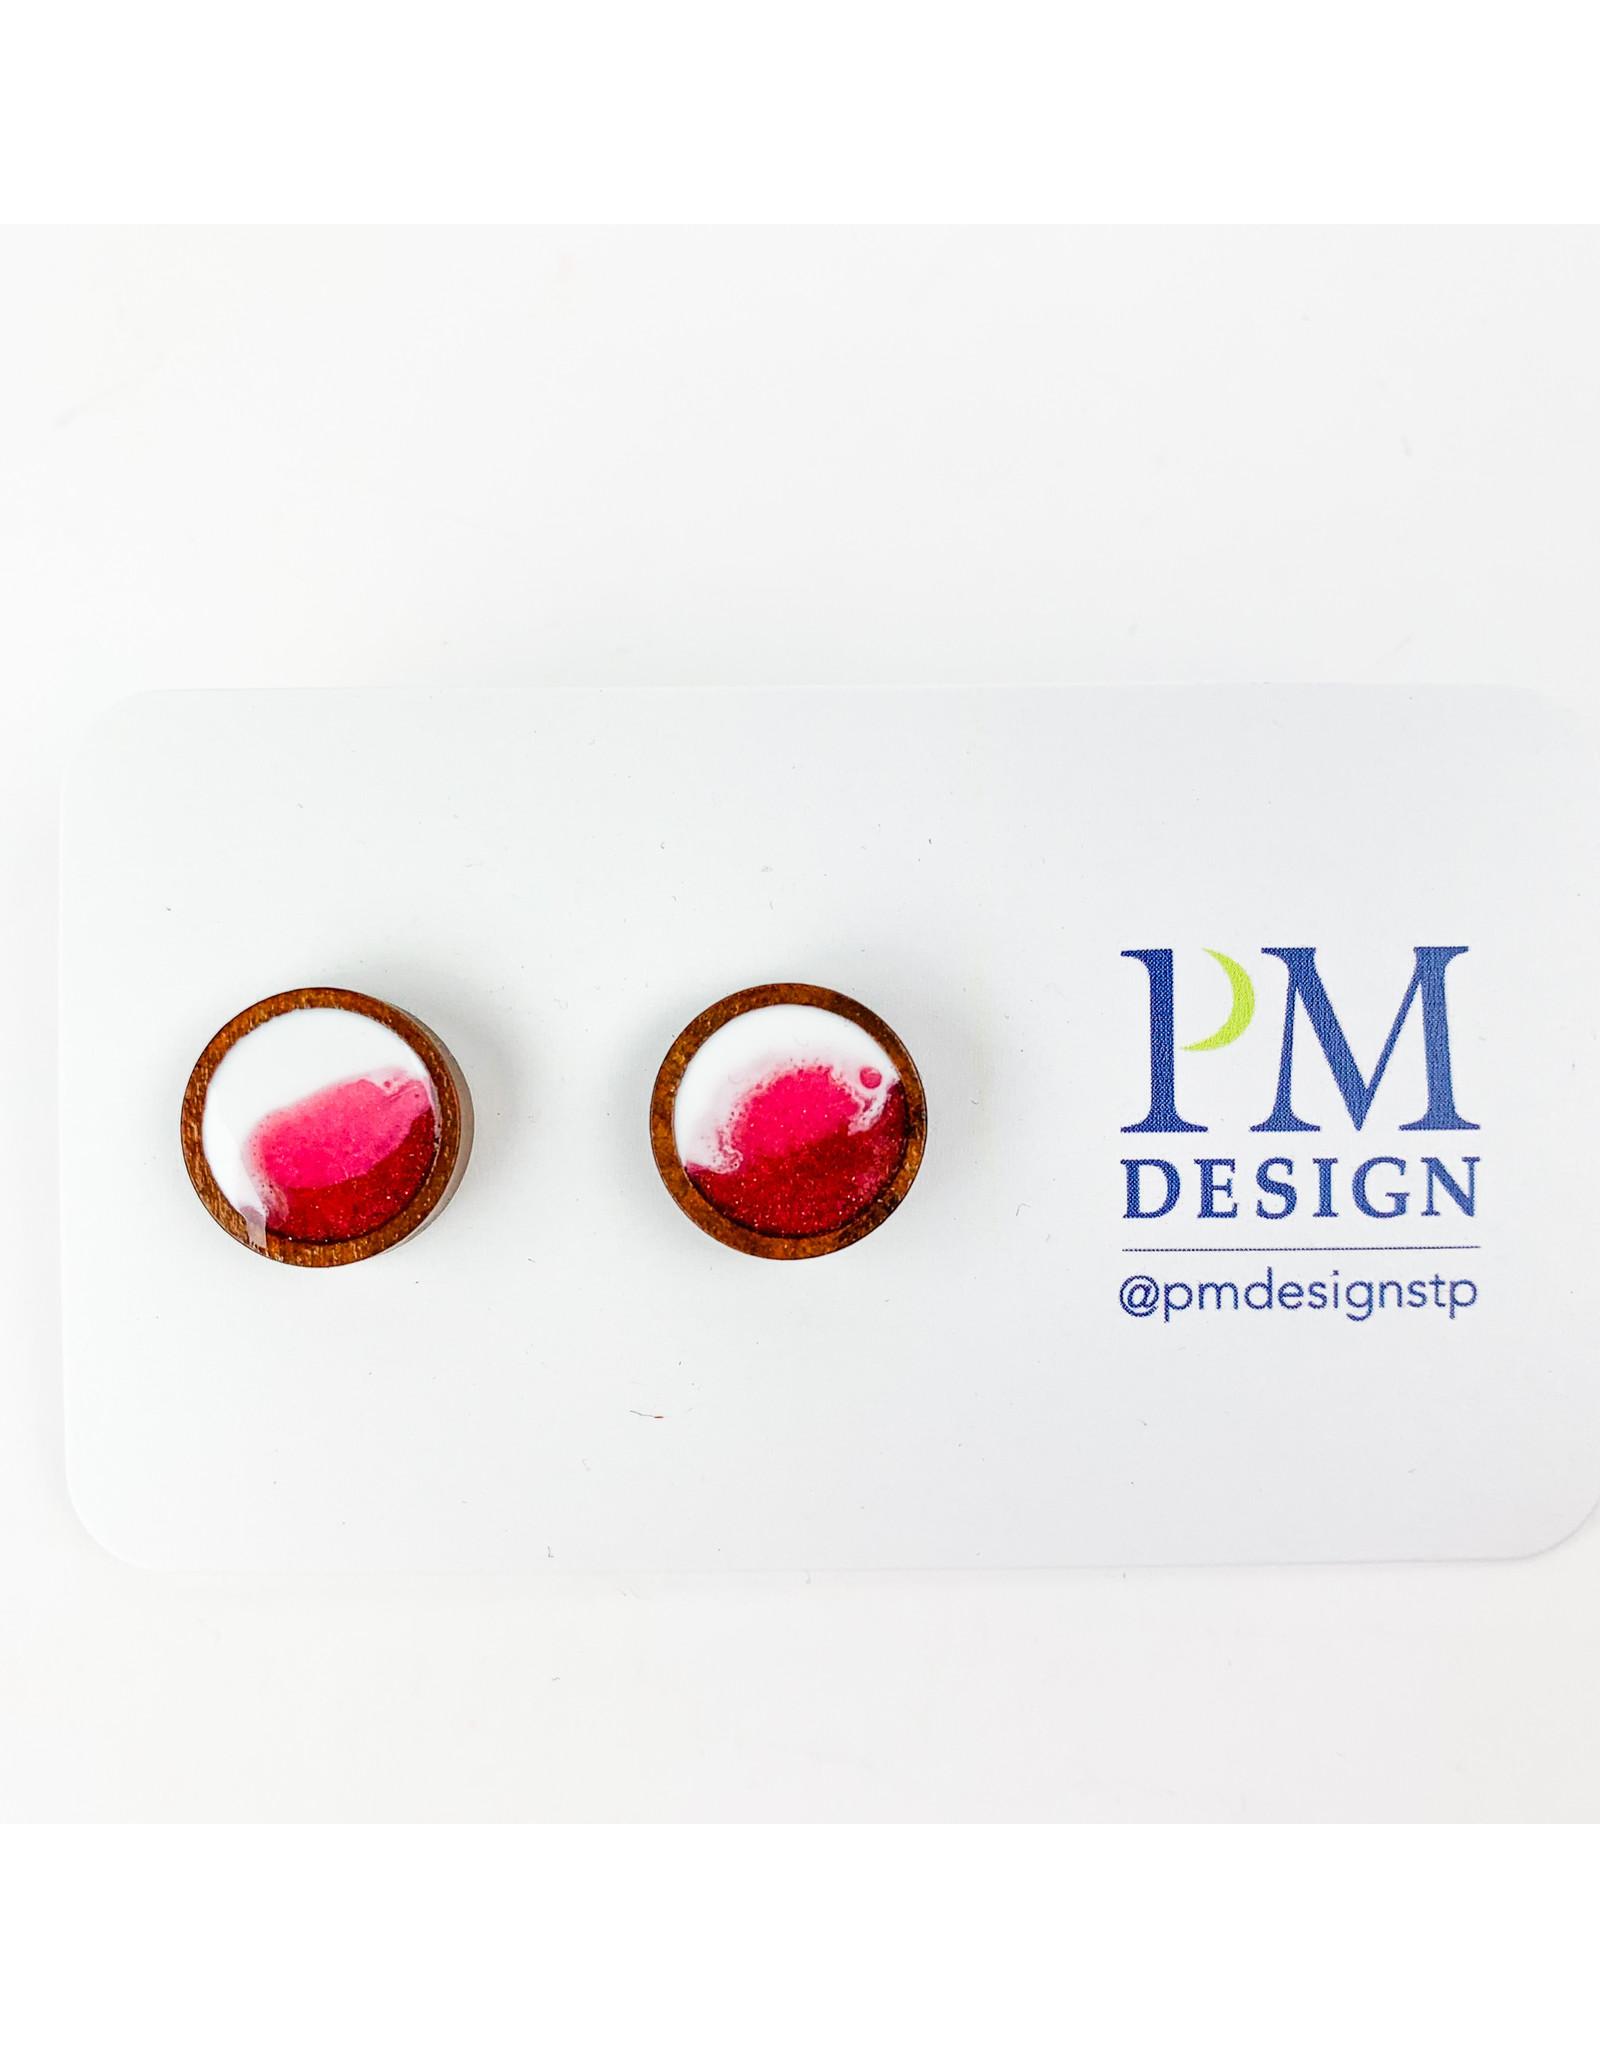 PM Design - Consignment Stud - Pink Blob Consignment